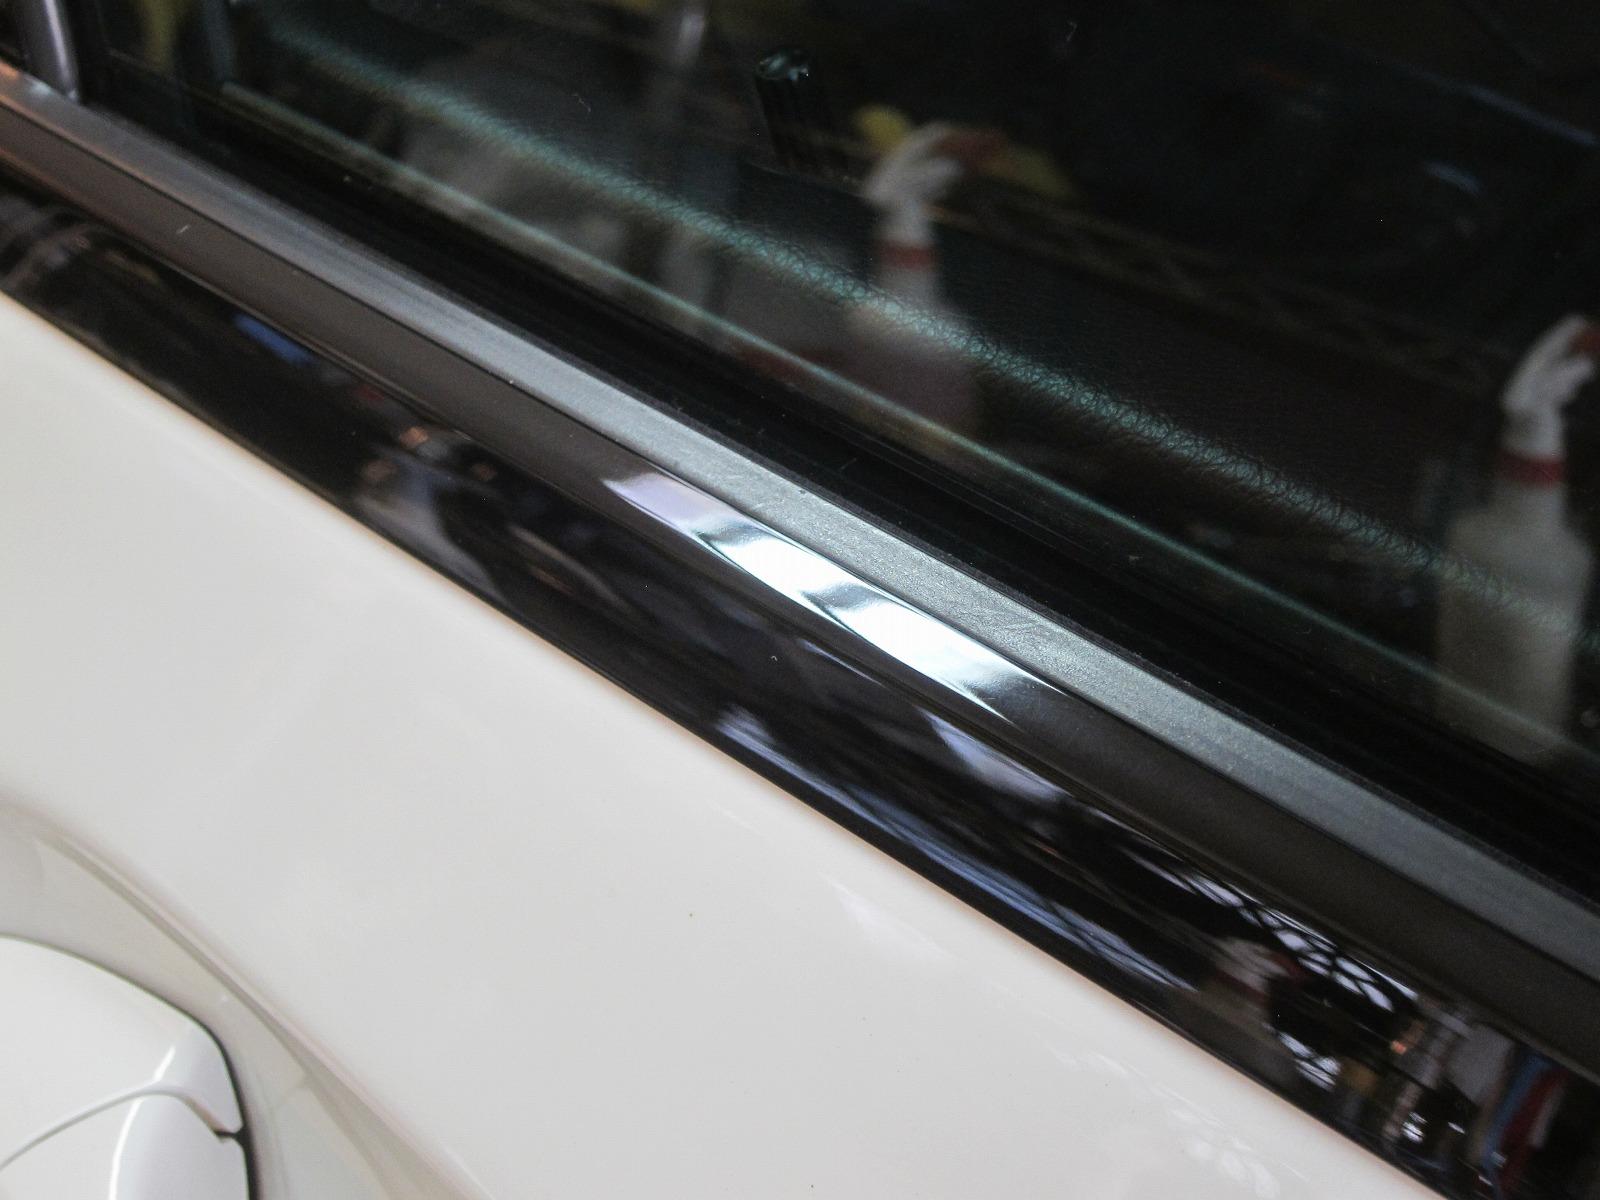 20160814-mercedes-benz-a180-08